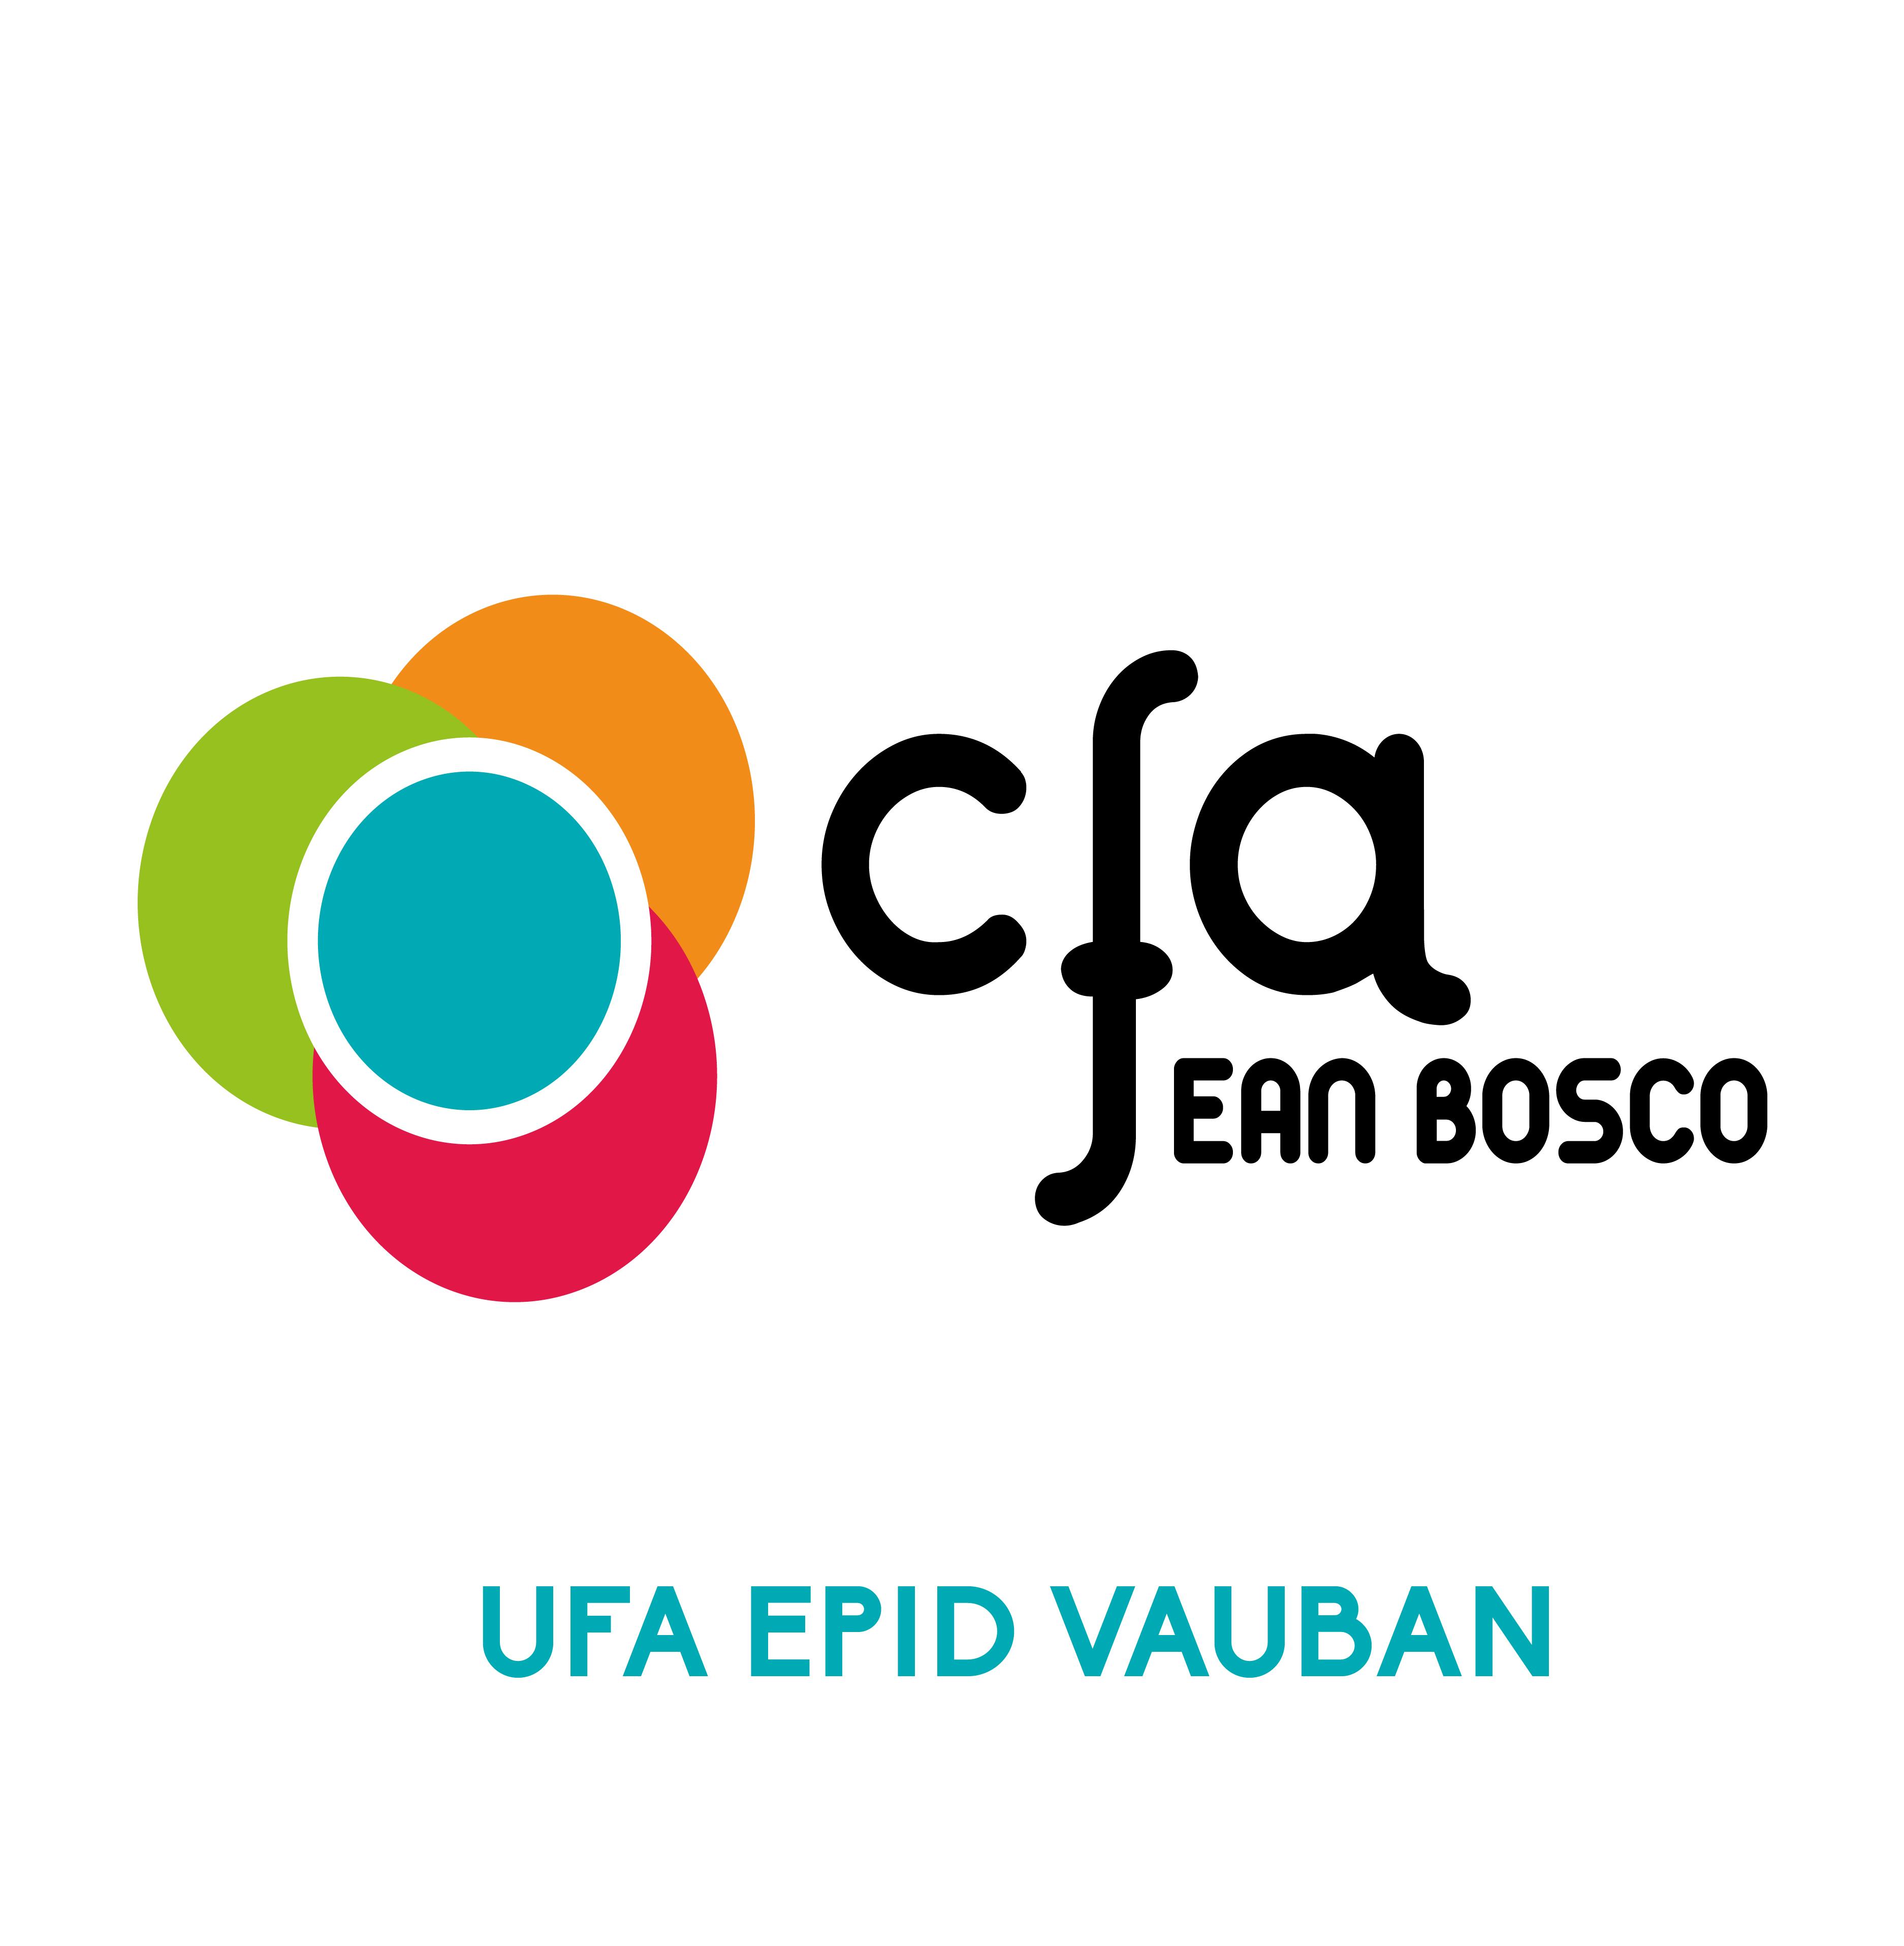 LOGO CFA-EPID-VAUBAN